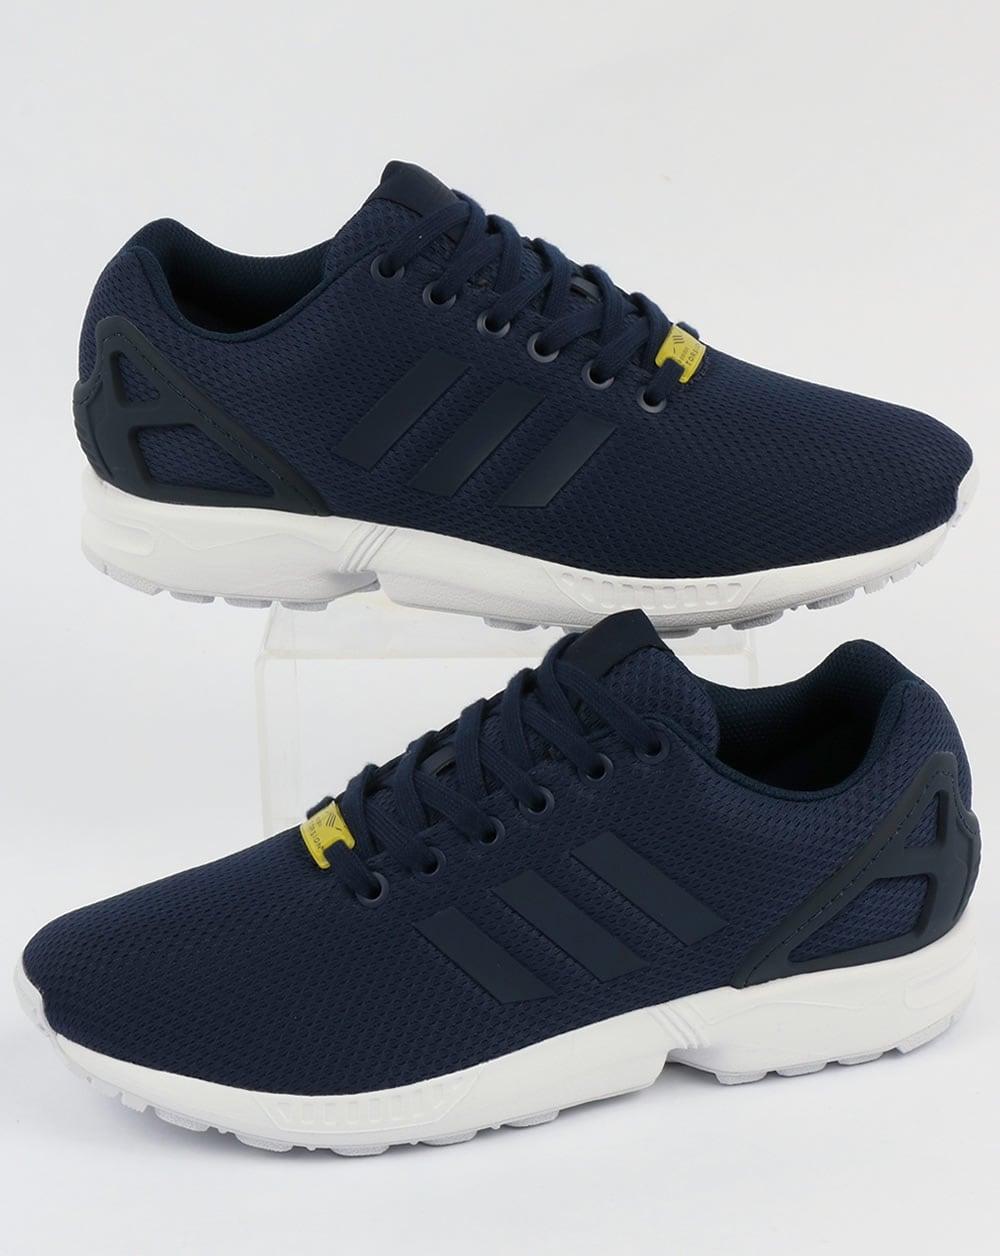 adidas torsion zx flux navy- OFF 57